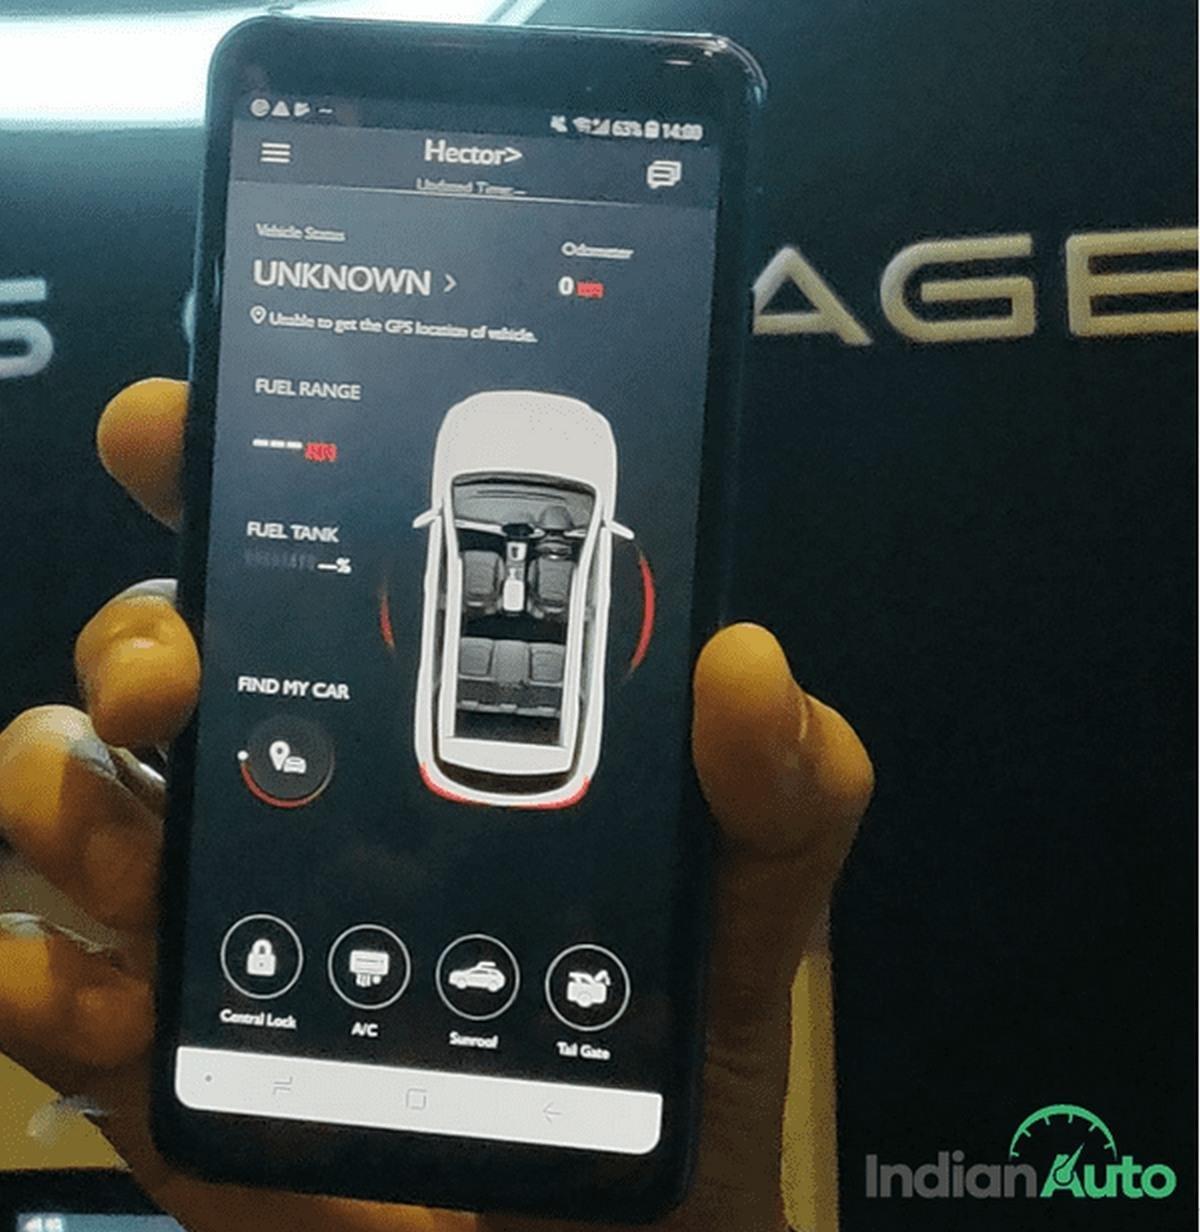 MG Hector smartphone apps